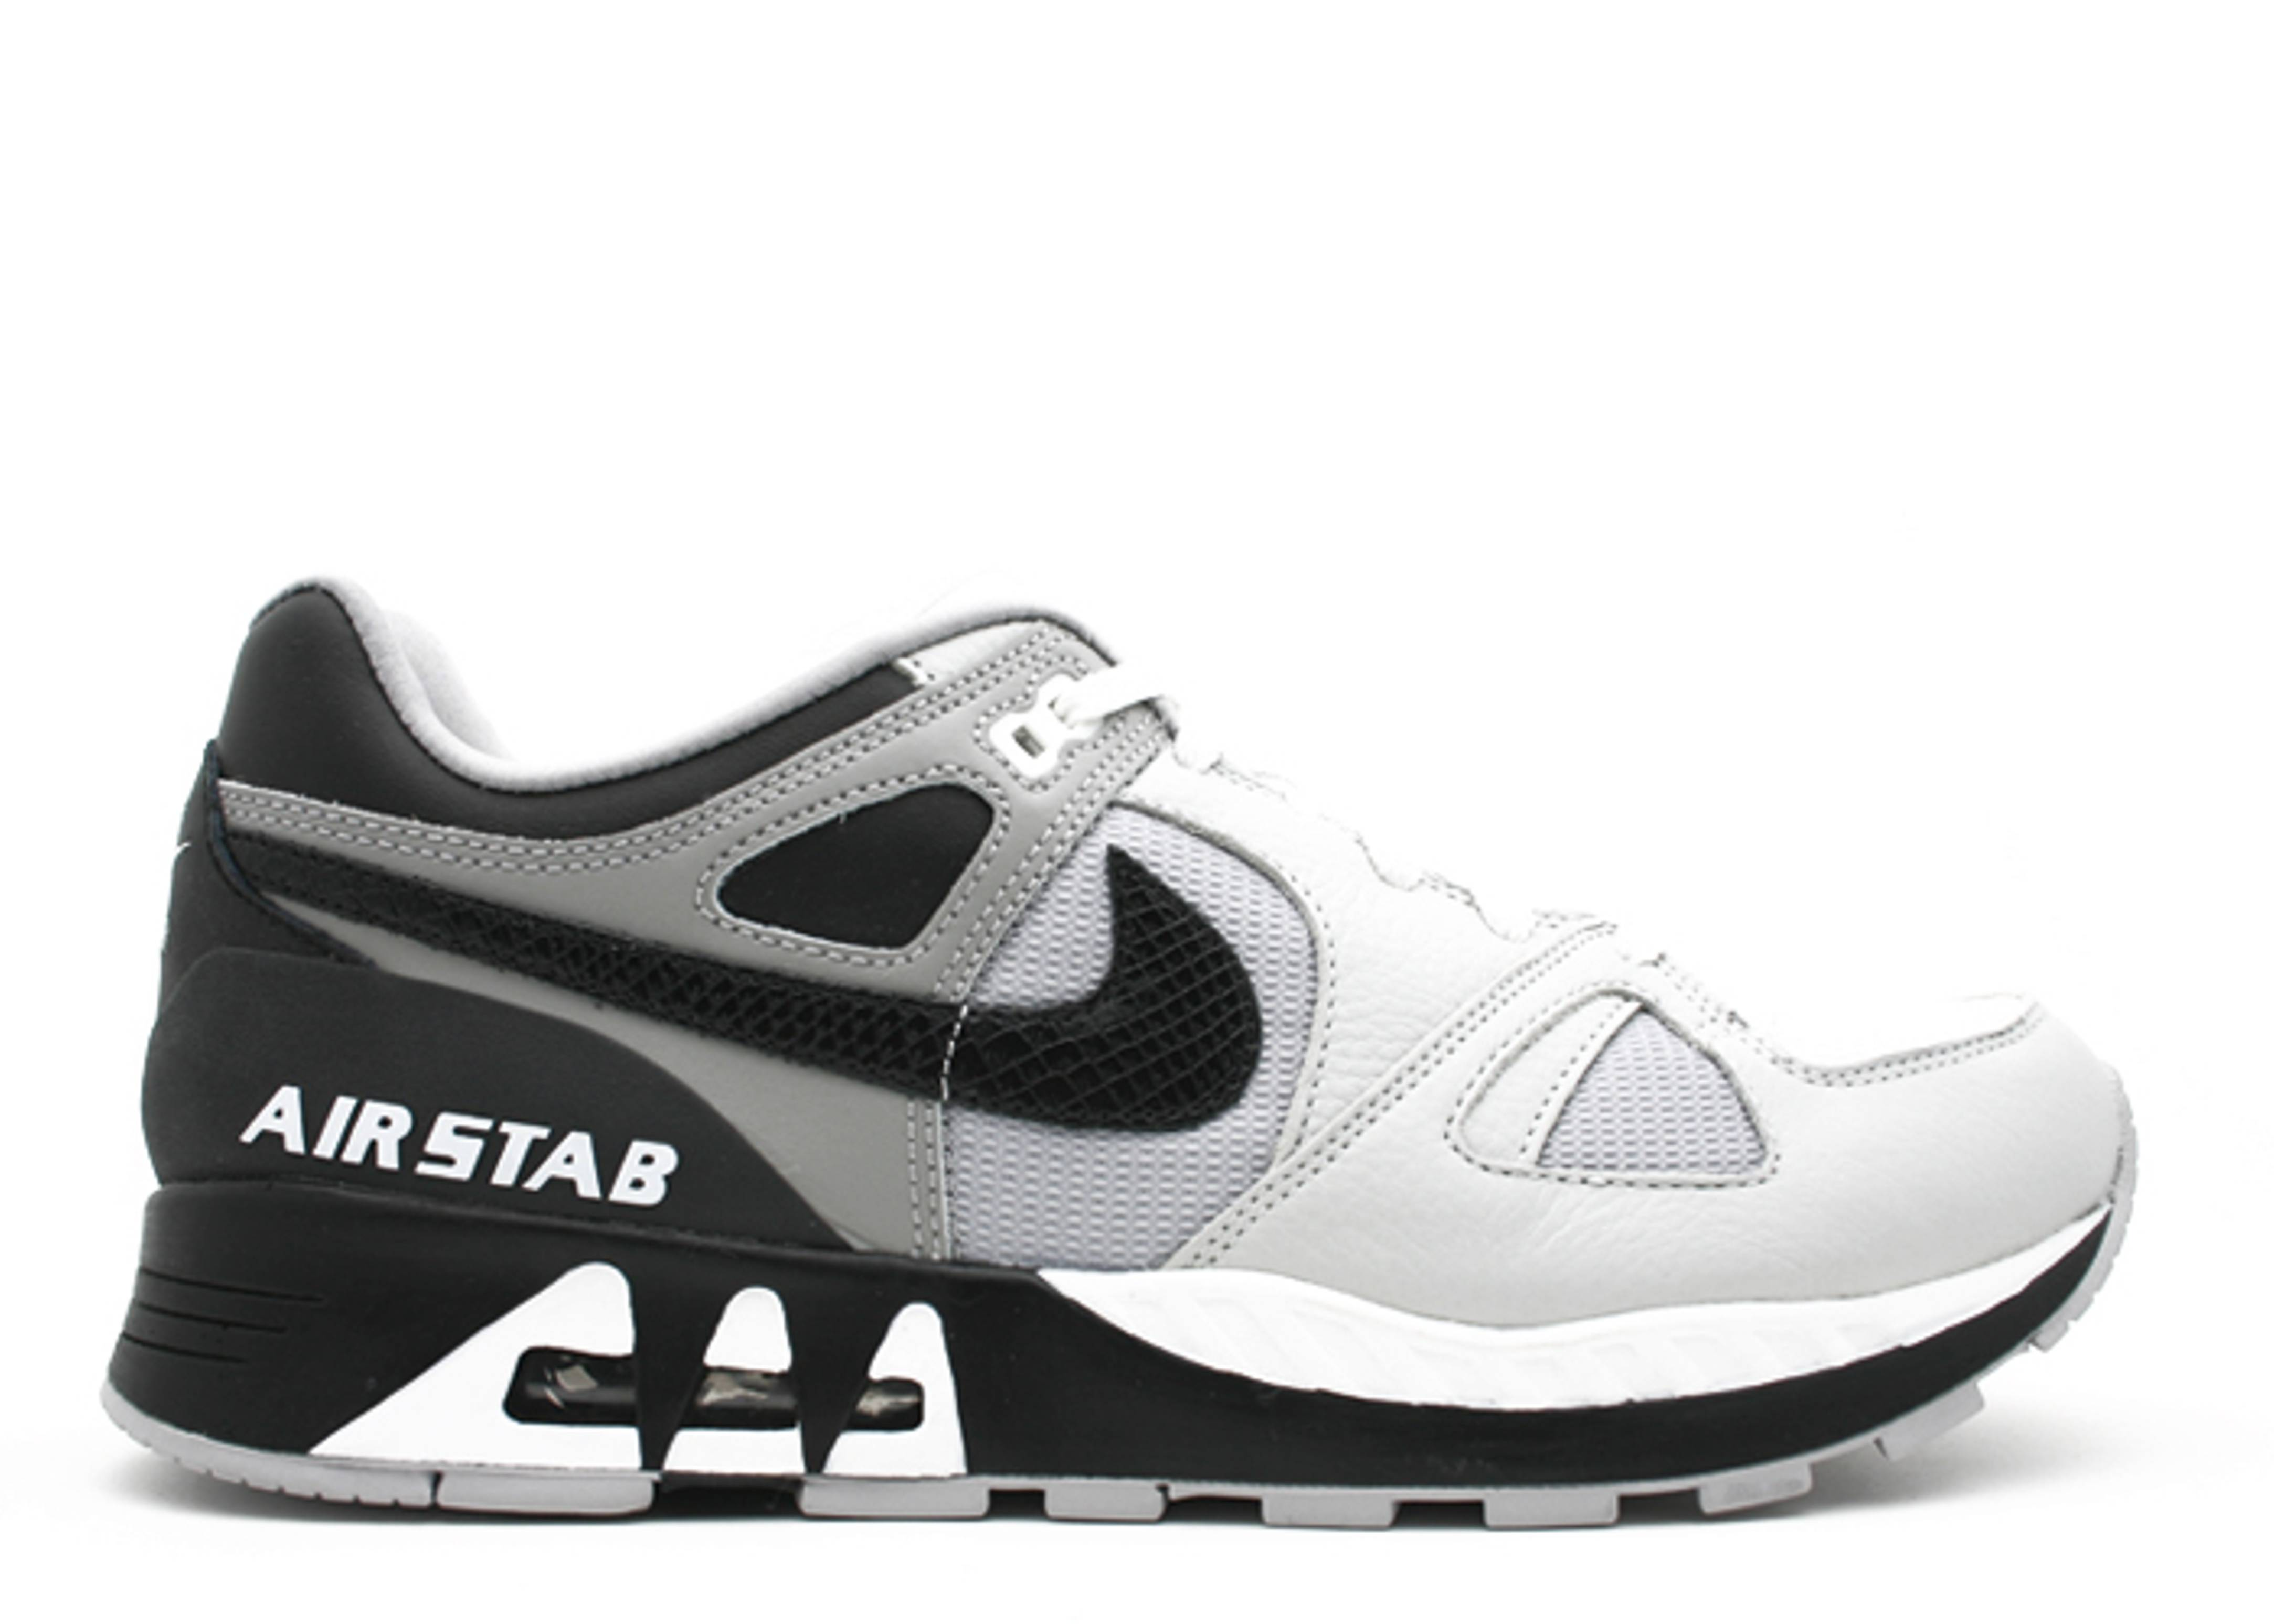 hot sale online fe089 f14ca Air Stab - Nike - 316402 101 - white black light charcoal metallic ...